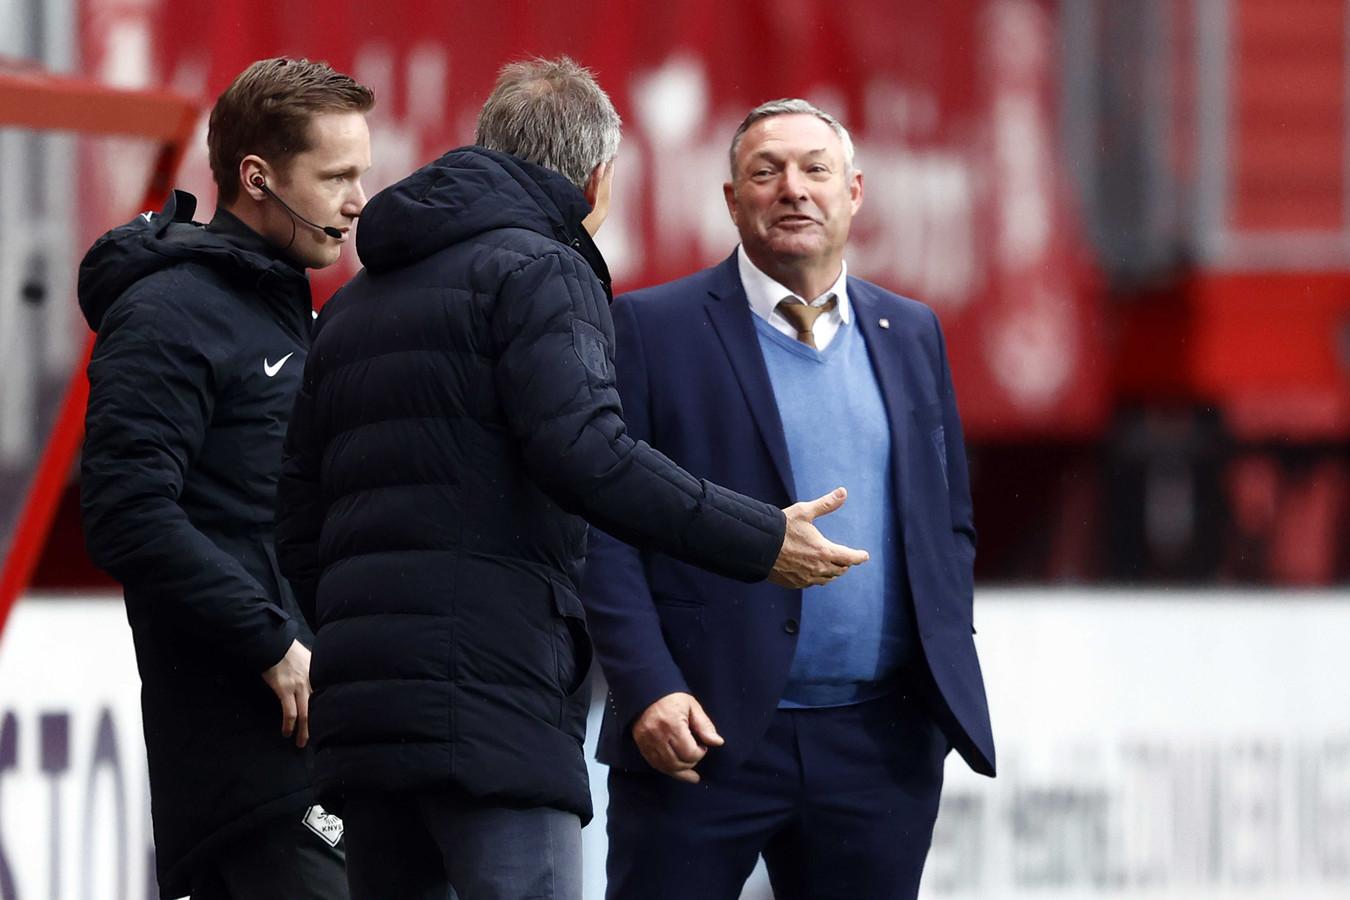 FC Twente-trainer Ron Jans in discussie met Heracles Almelo-trainer Frank Wormuth na de VAR-beslissing.